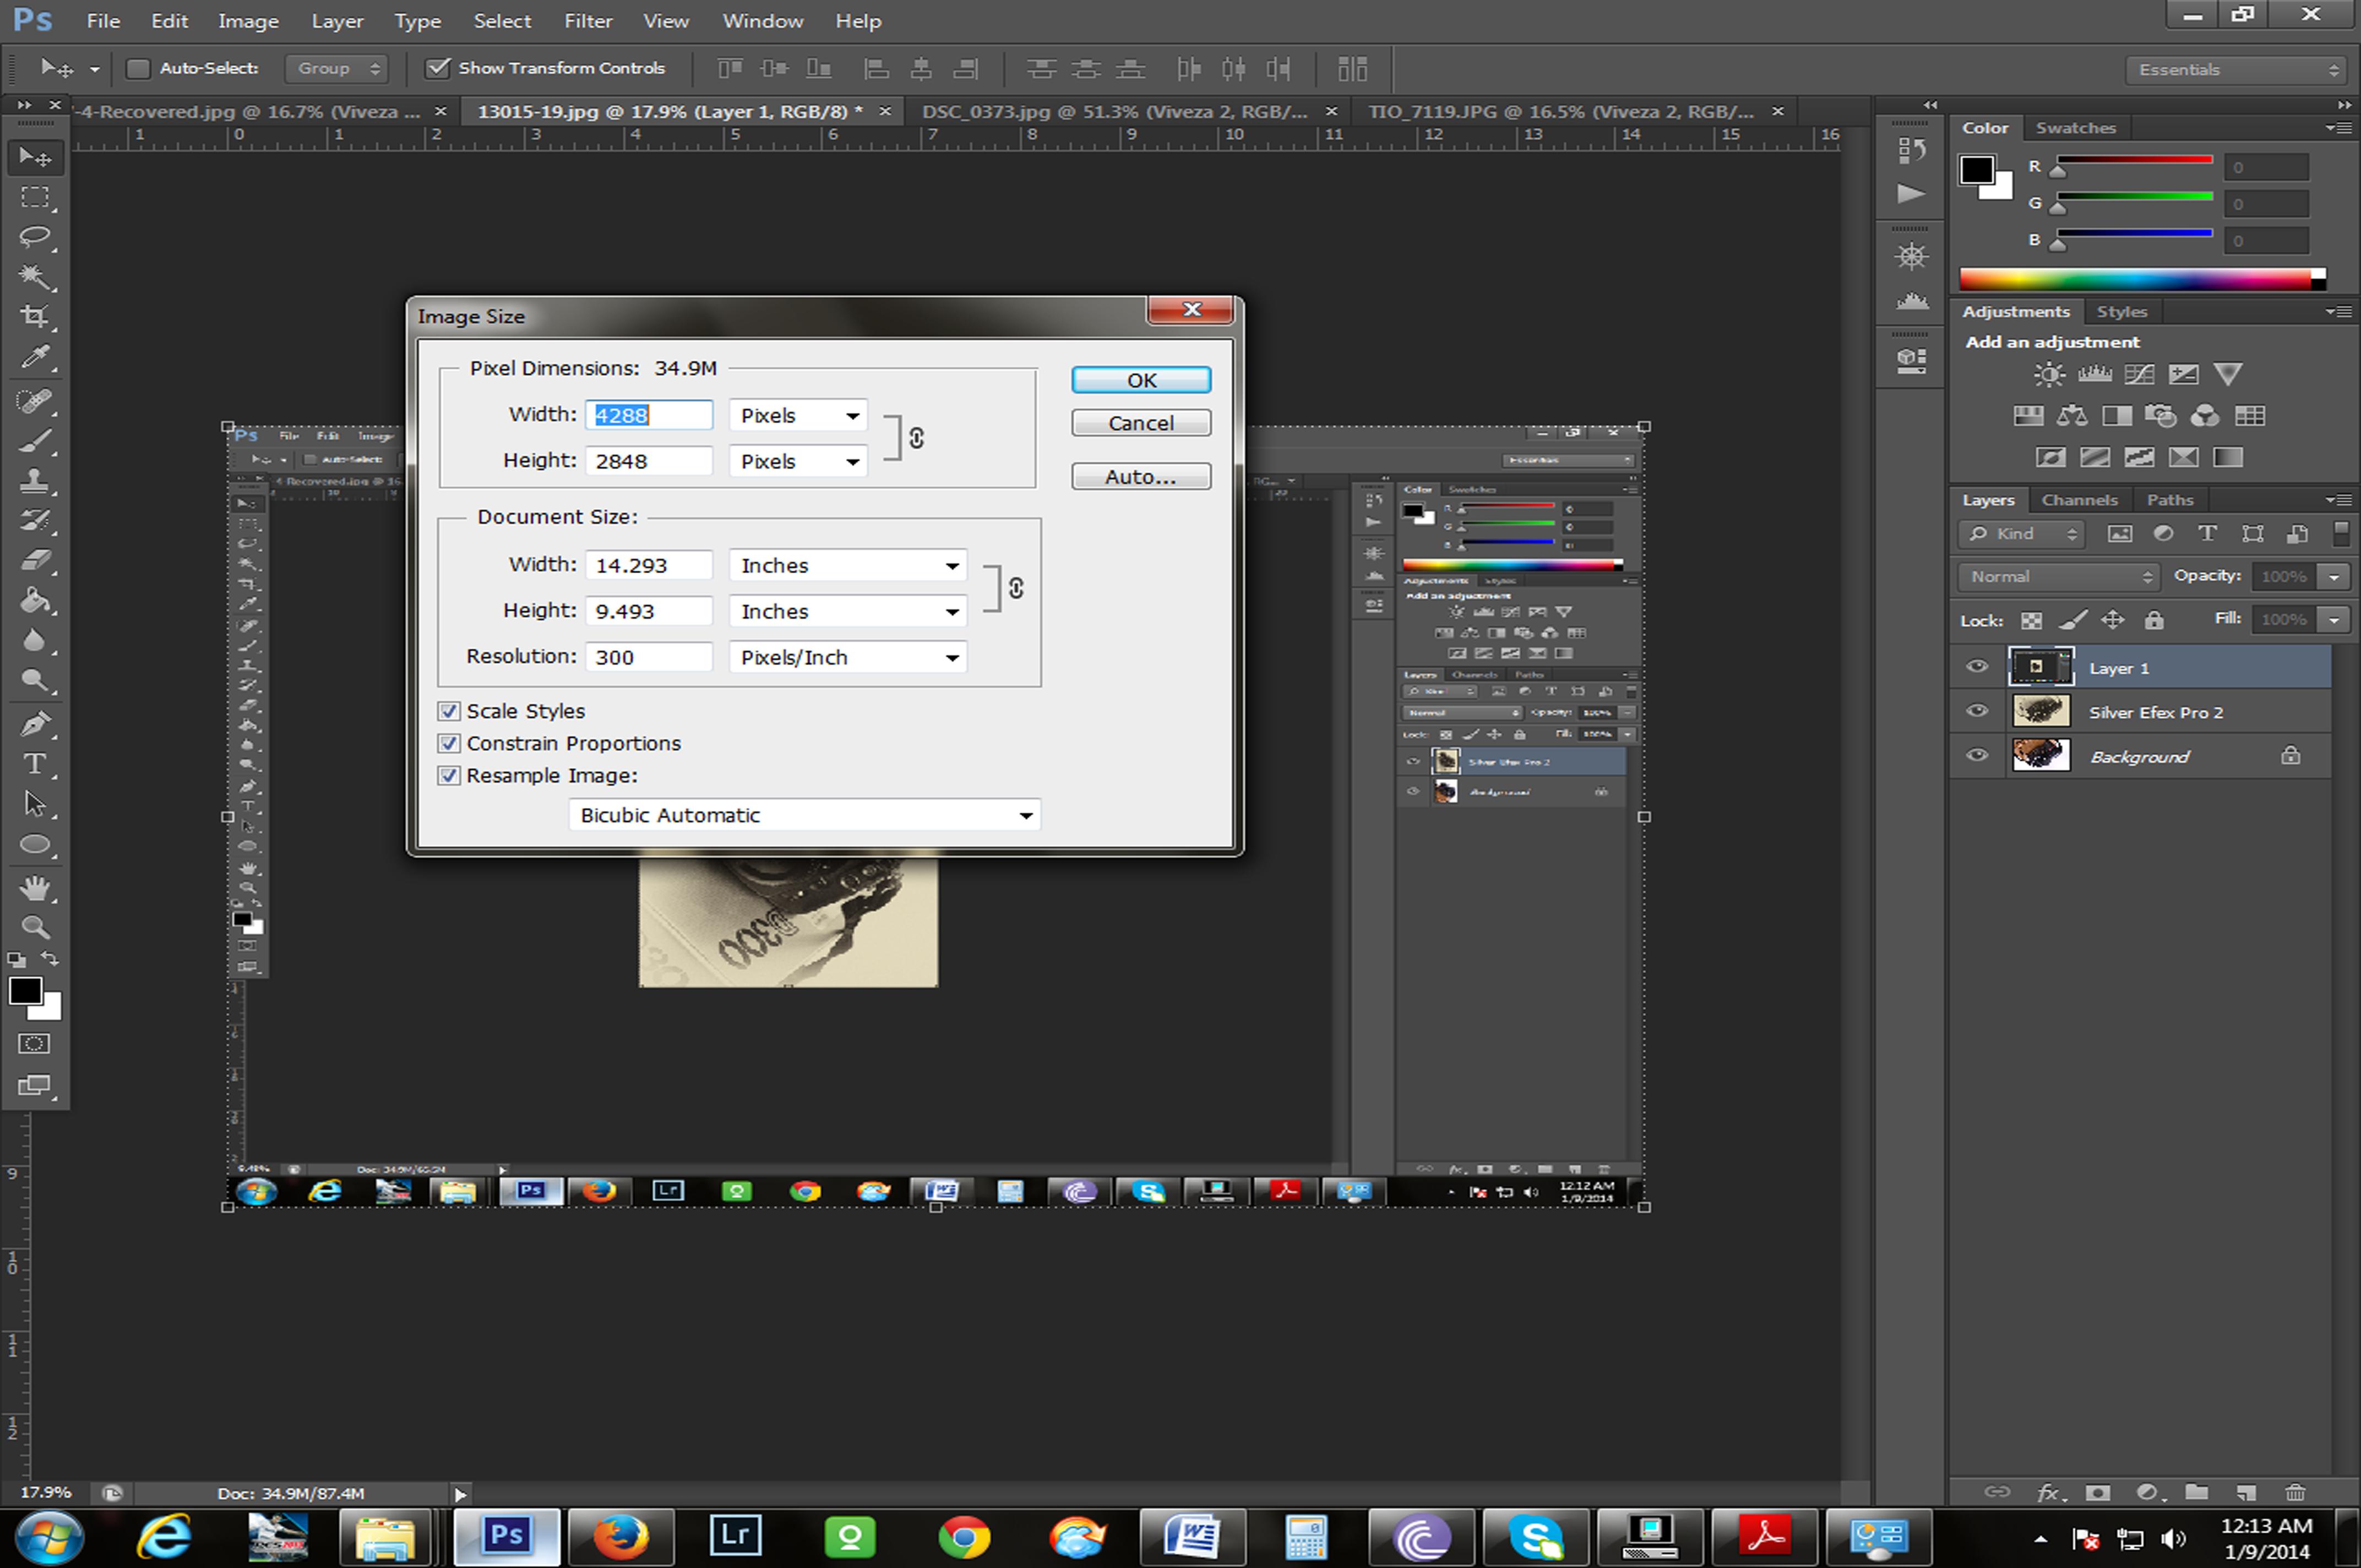 Calmly Make Digital S Print On 3x5 Or 4x6 Photo Paper Step 24 4x6 Photo Size Vs 5x7 4x6 Photo Size Mm dpreview 4x6 Photo Size